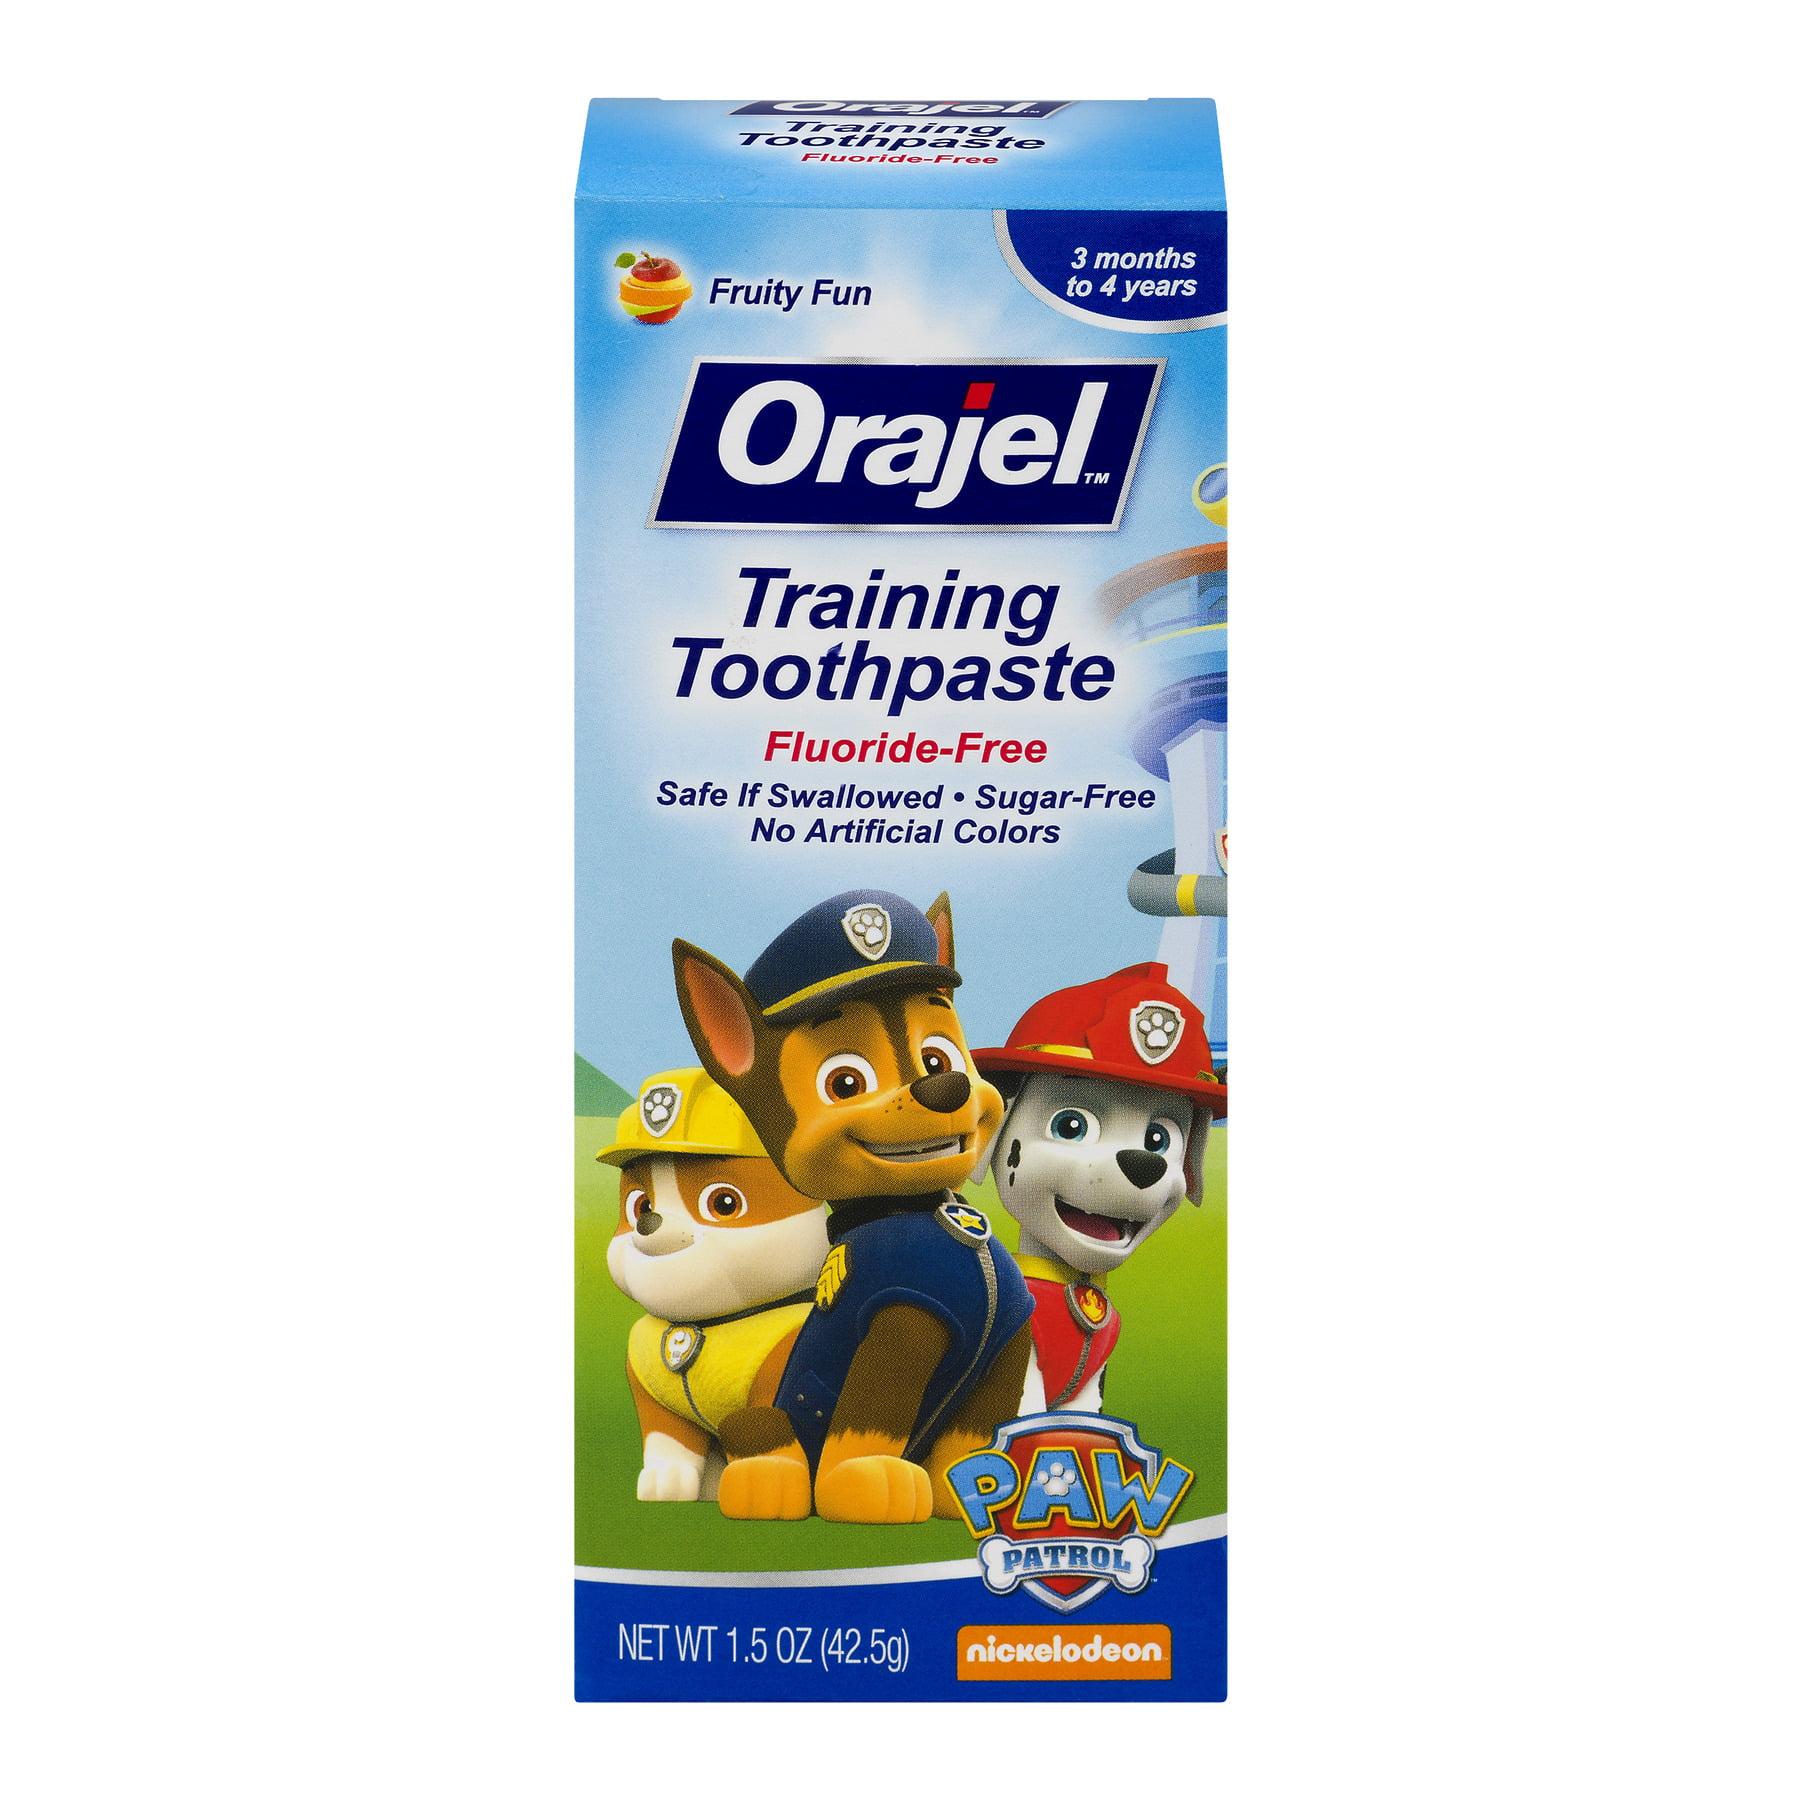 Orajel Training Toothpaste Fluoride-Free Paw Patrol, 1.5 OZ